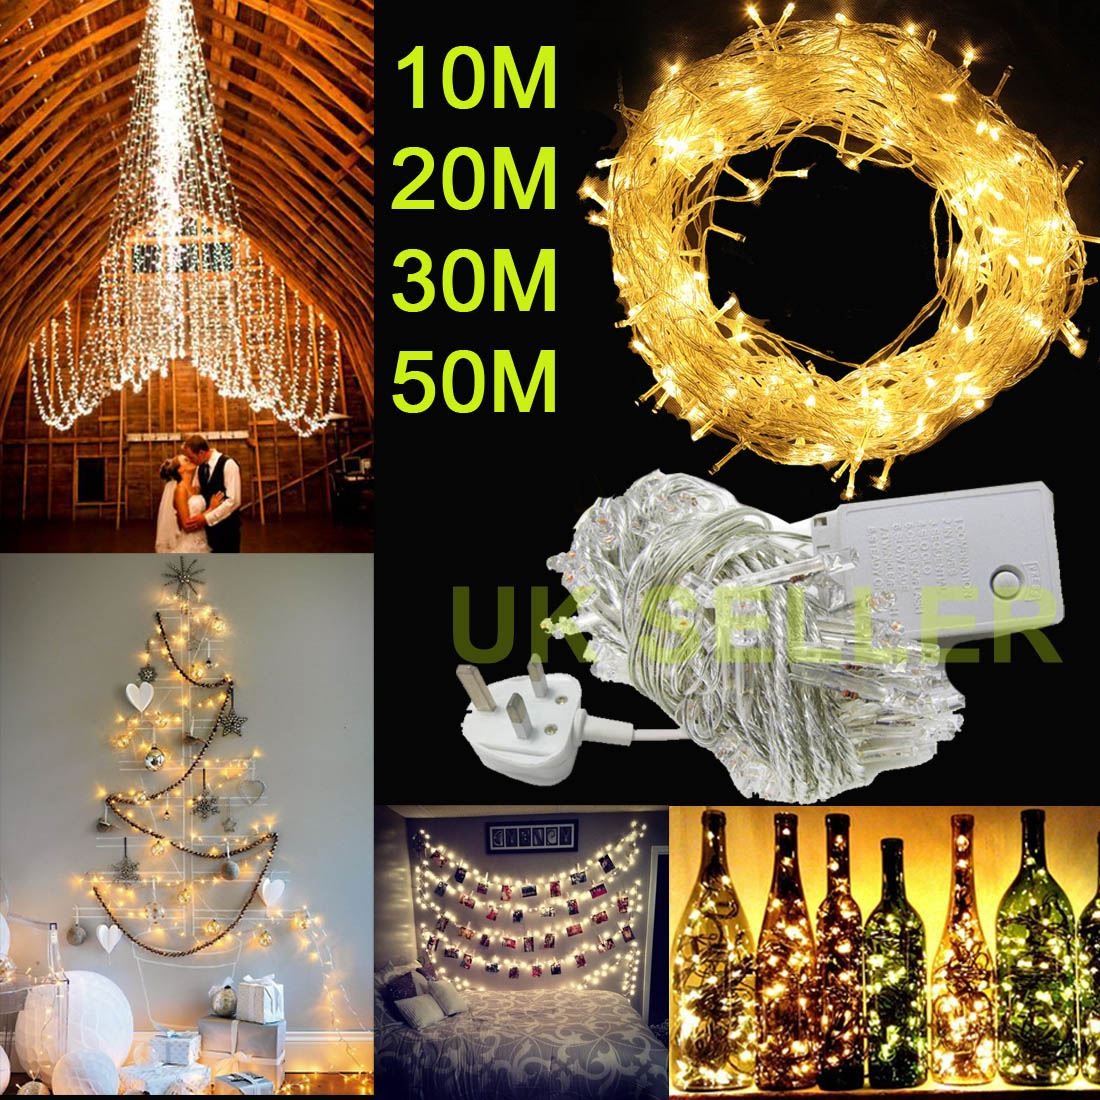 Indoor String Lights Diy : 100/200/300/500 LED String Fairy Lights Indoor/Outdoor Xmas Christmas Party DIY eBay